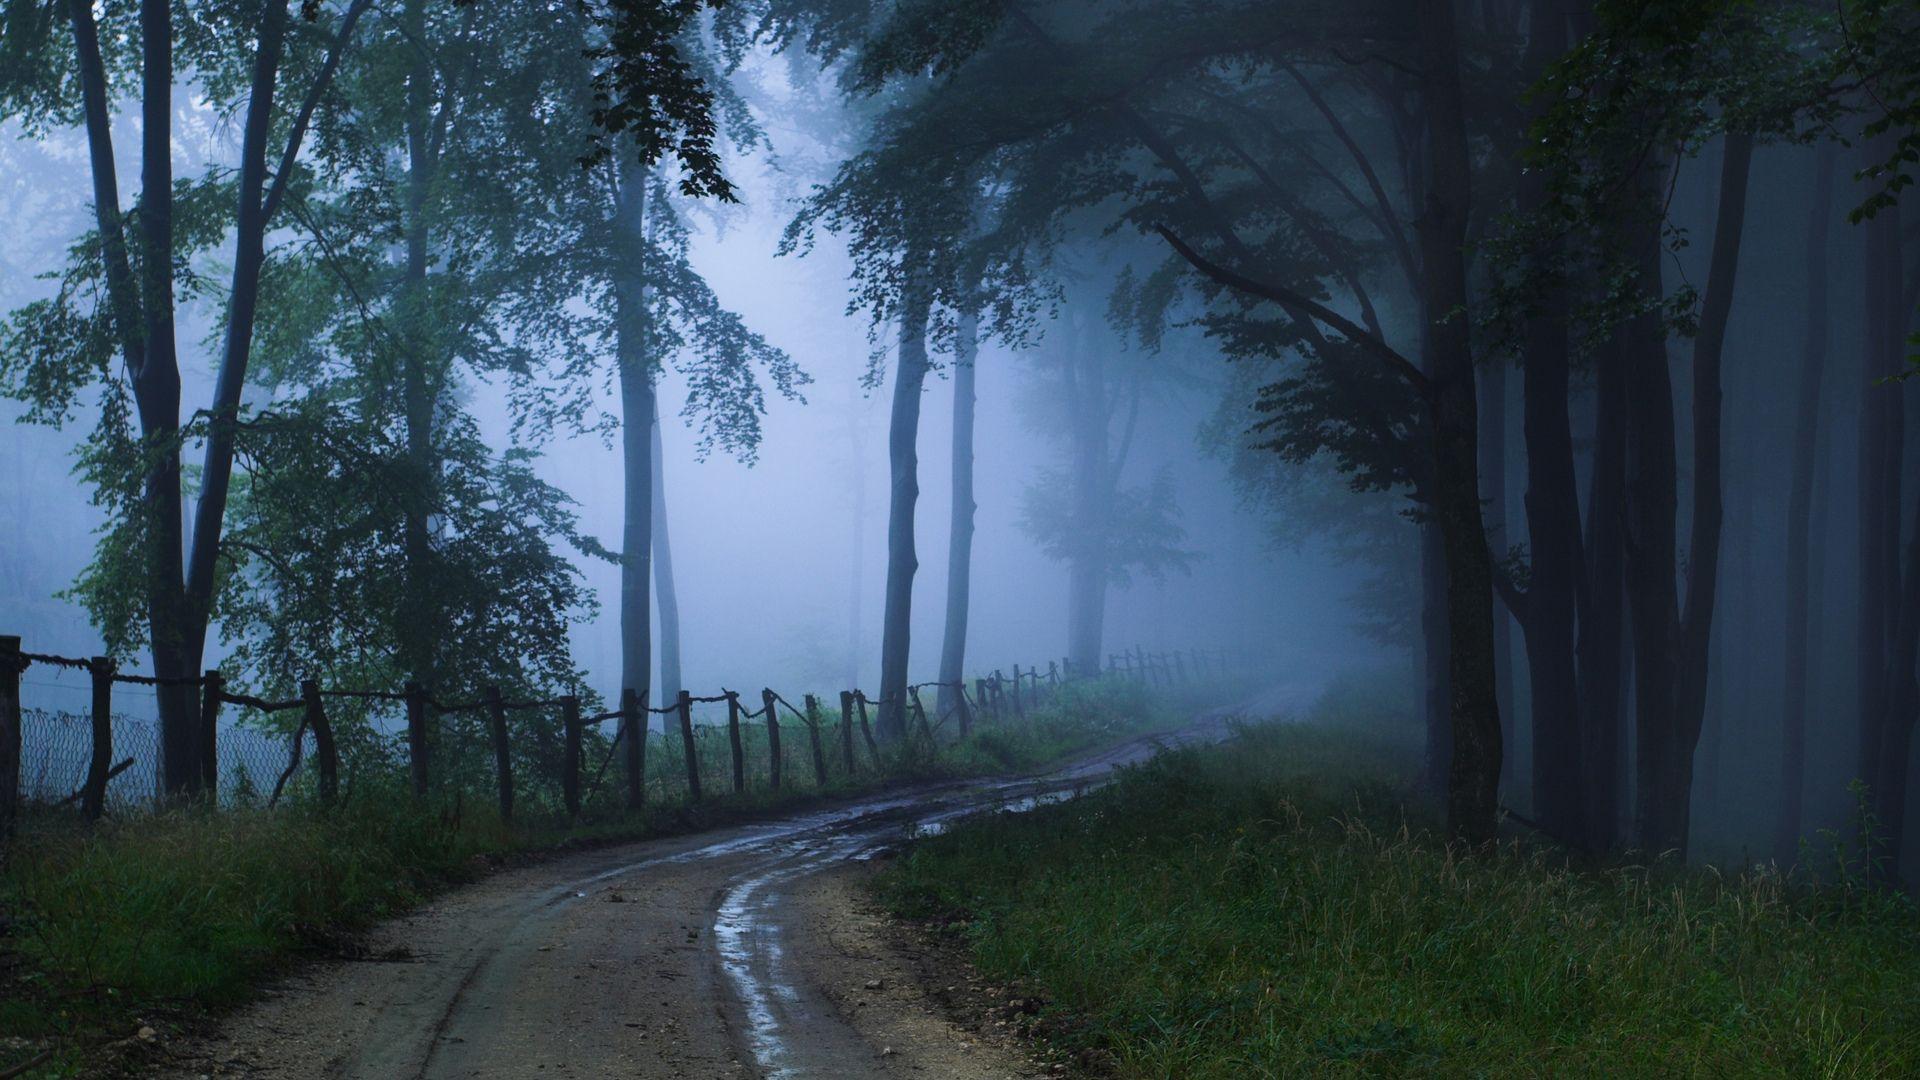 Fog wallpaper image hd